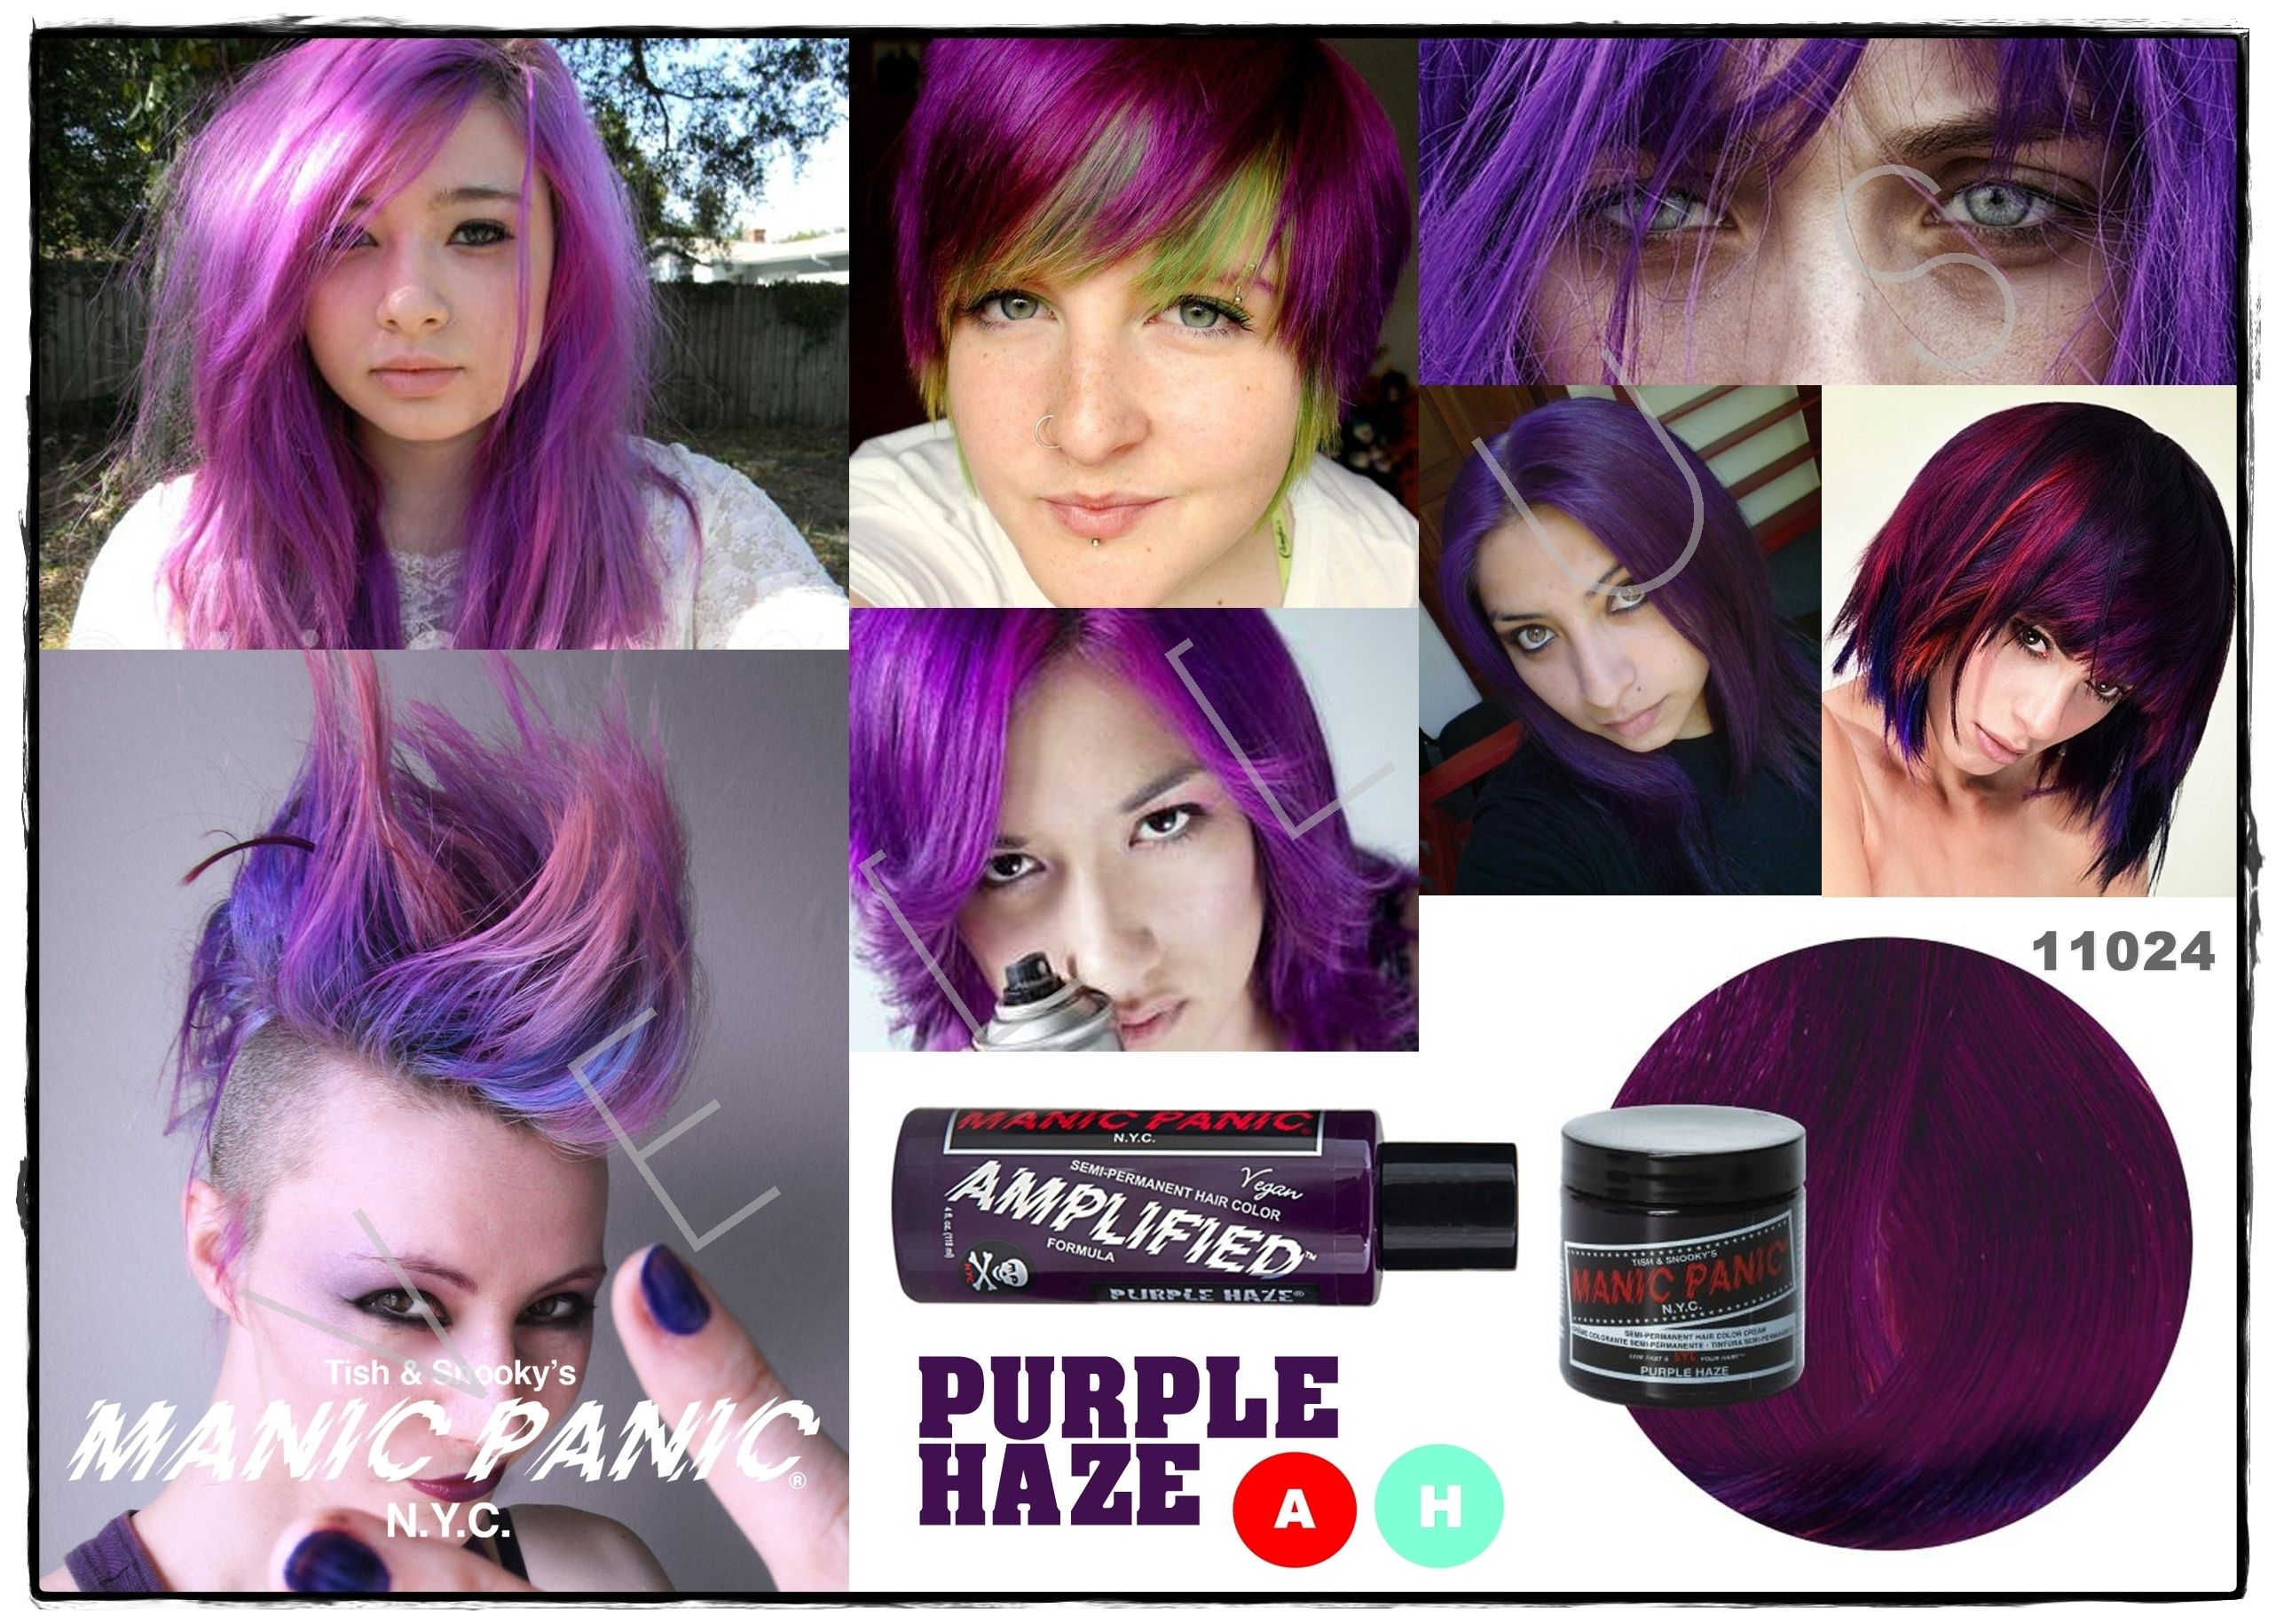 Manic Panic Amplified Purple Haze Vellus Hair Studio 83a Tanjong Pagar Road S 088504 Tel 62246566 Hair Studio Manic Panic Hair Dye Vellus Hair